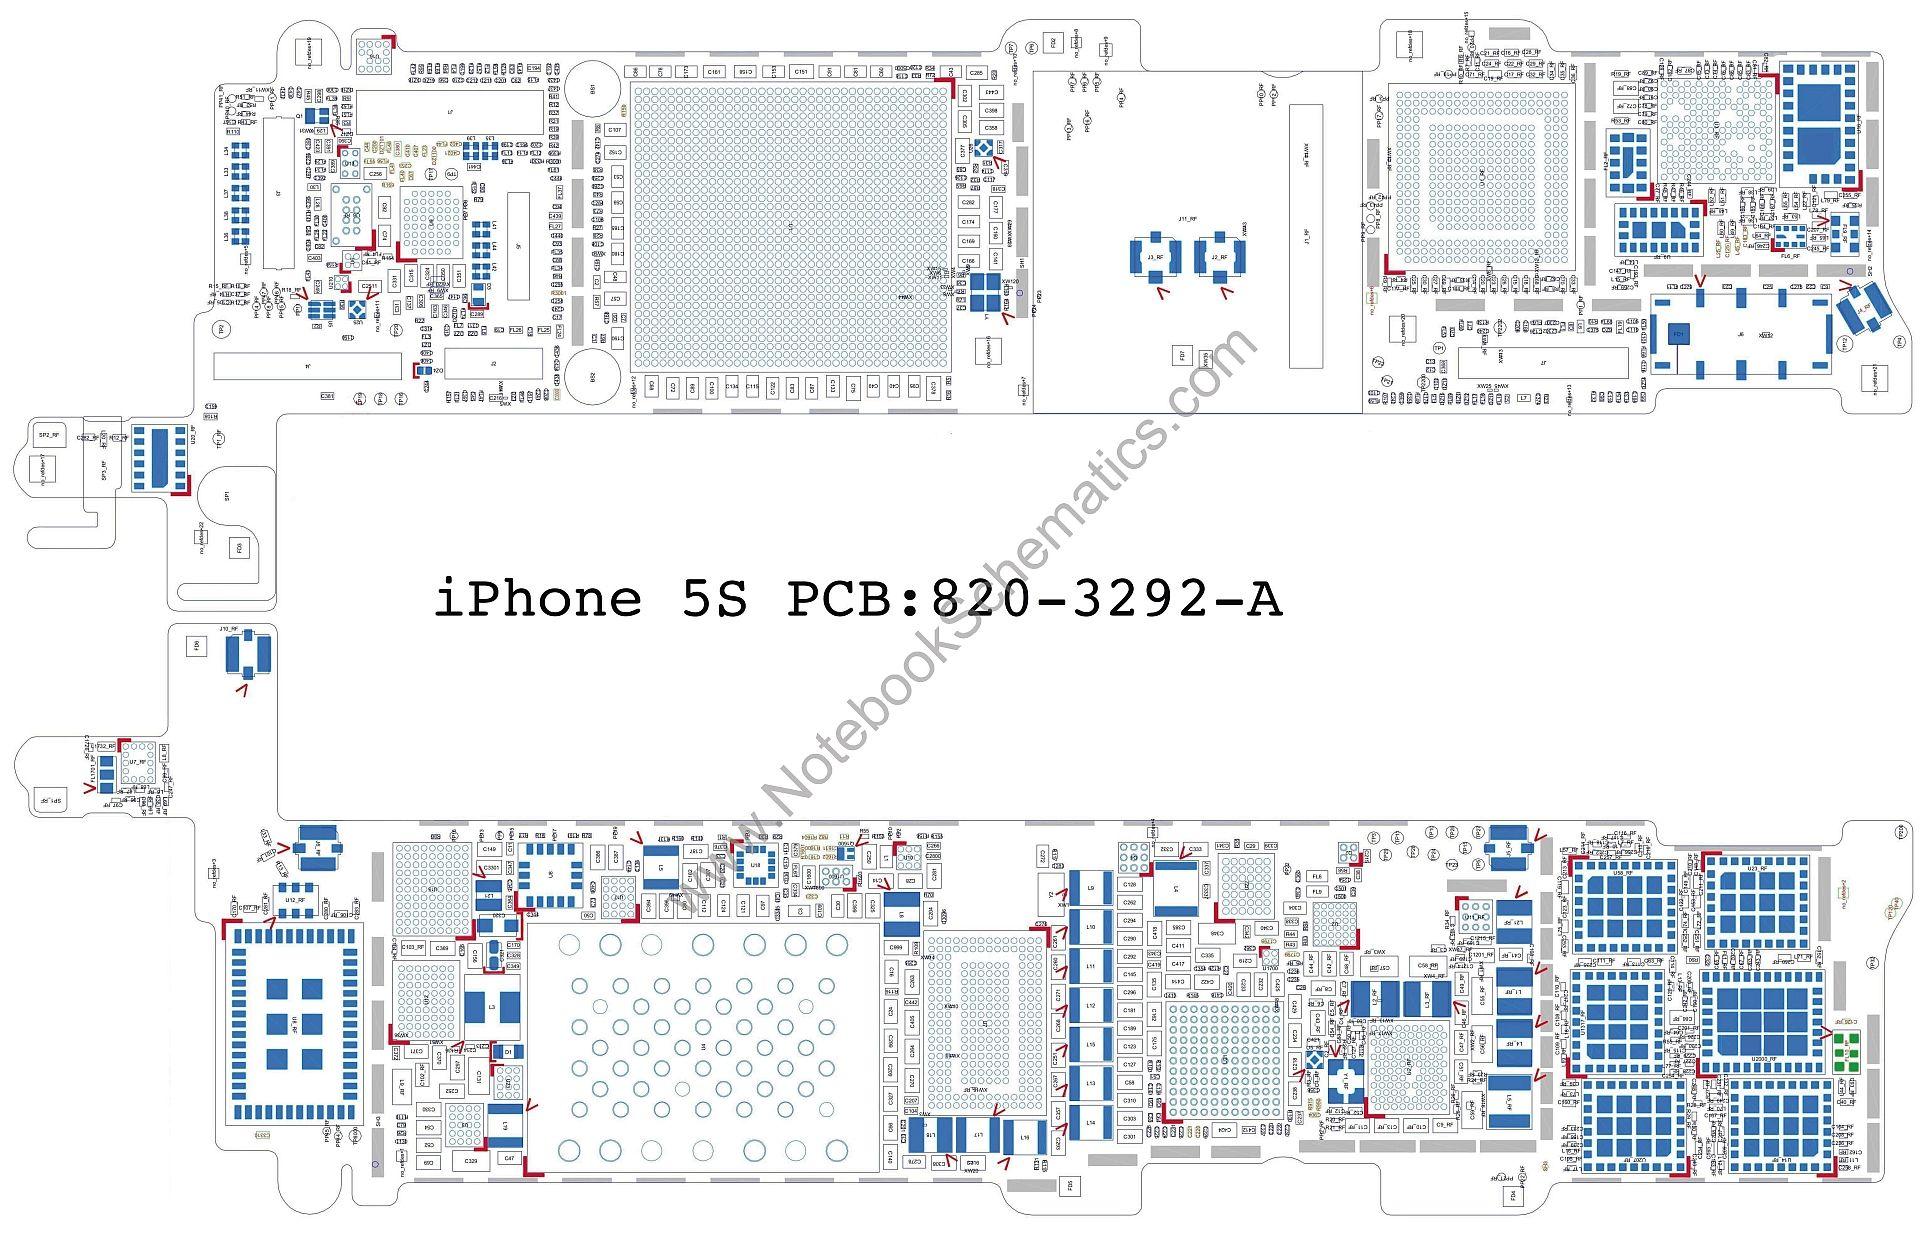 schematic iphone 5s zen diagram 222222 pinterest iphone 5s rh pinterest com iphone 5s diagram internal parts iphone 5 diagram assembly